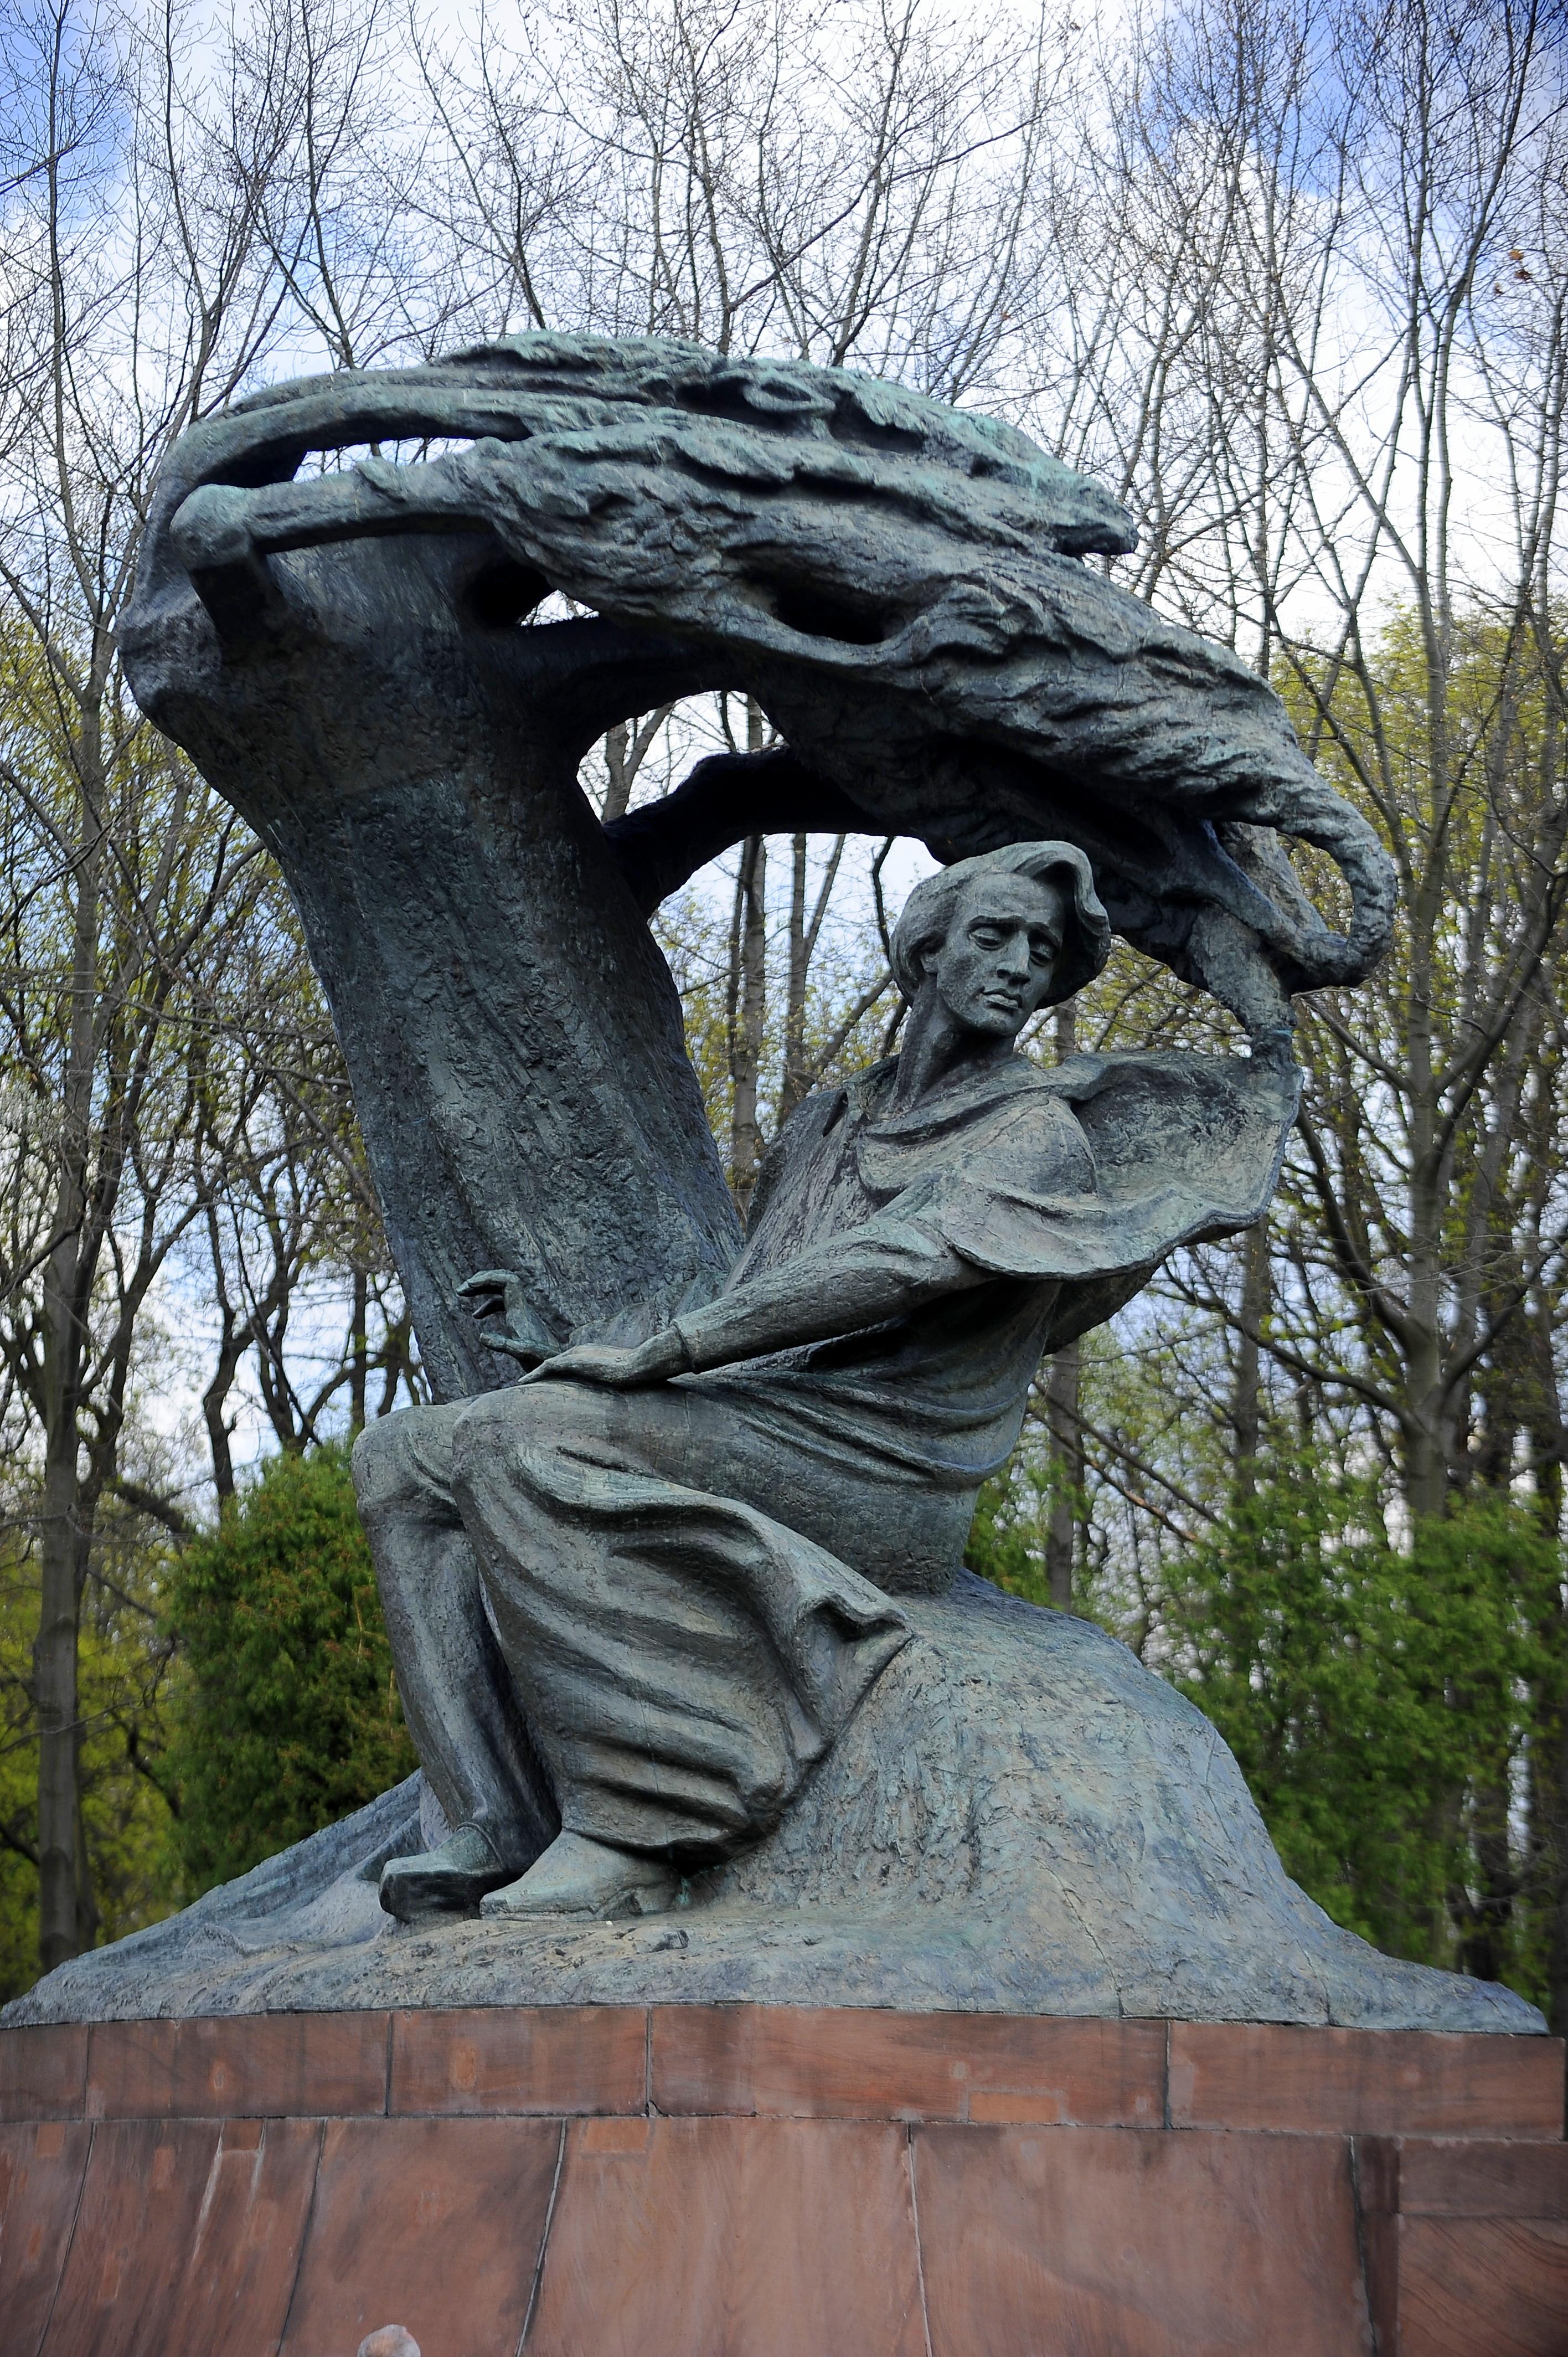 https://upload.wikimedia.org/wikipedia/commons/0/03/Pomnik_Chopina_w_Warszawie.jpg